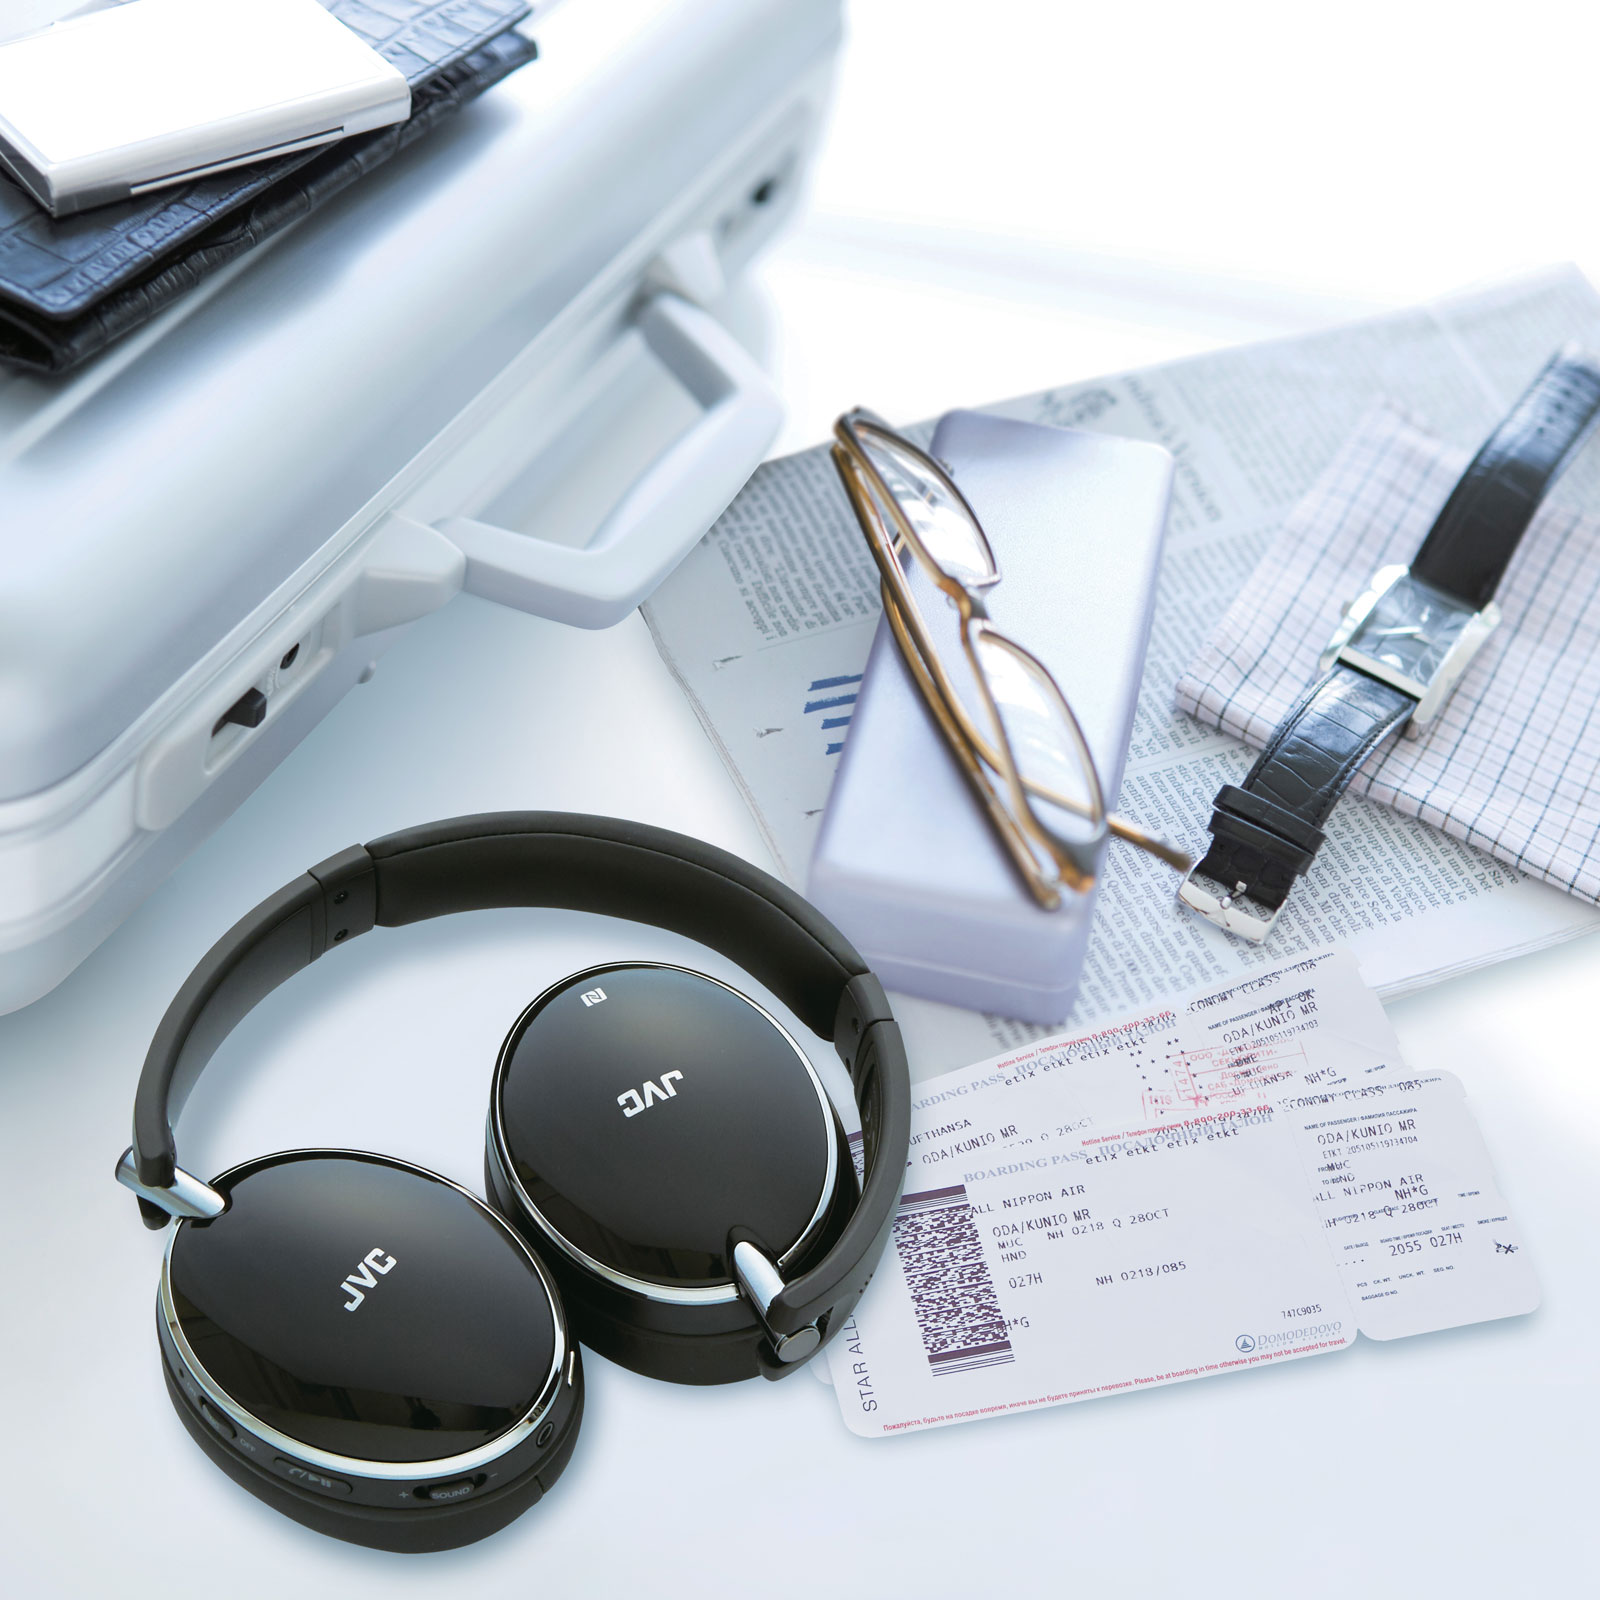 Jvc Ha S90bn Noise Cancelling Wireless Headphone Stereo Electronics